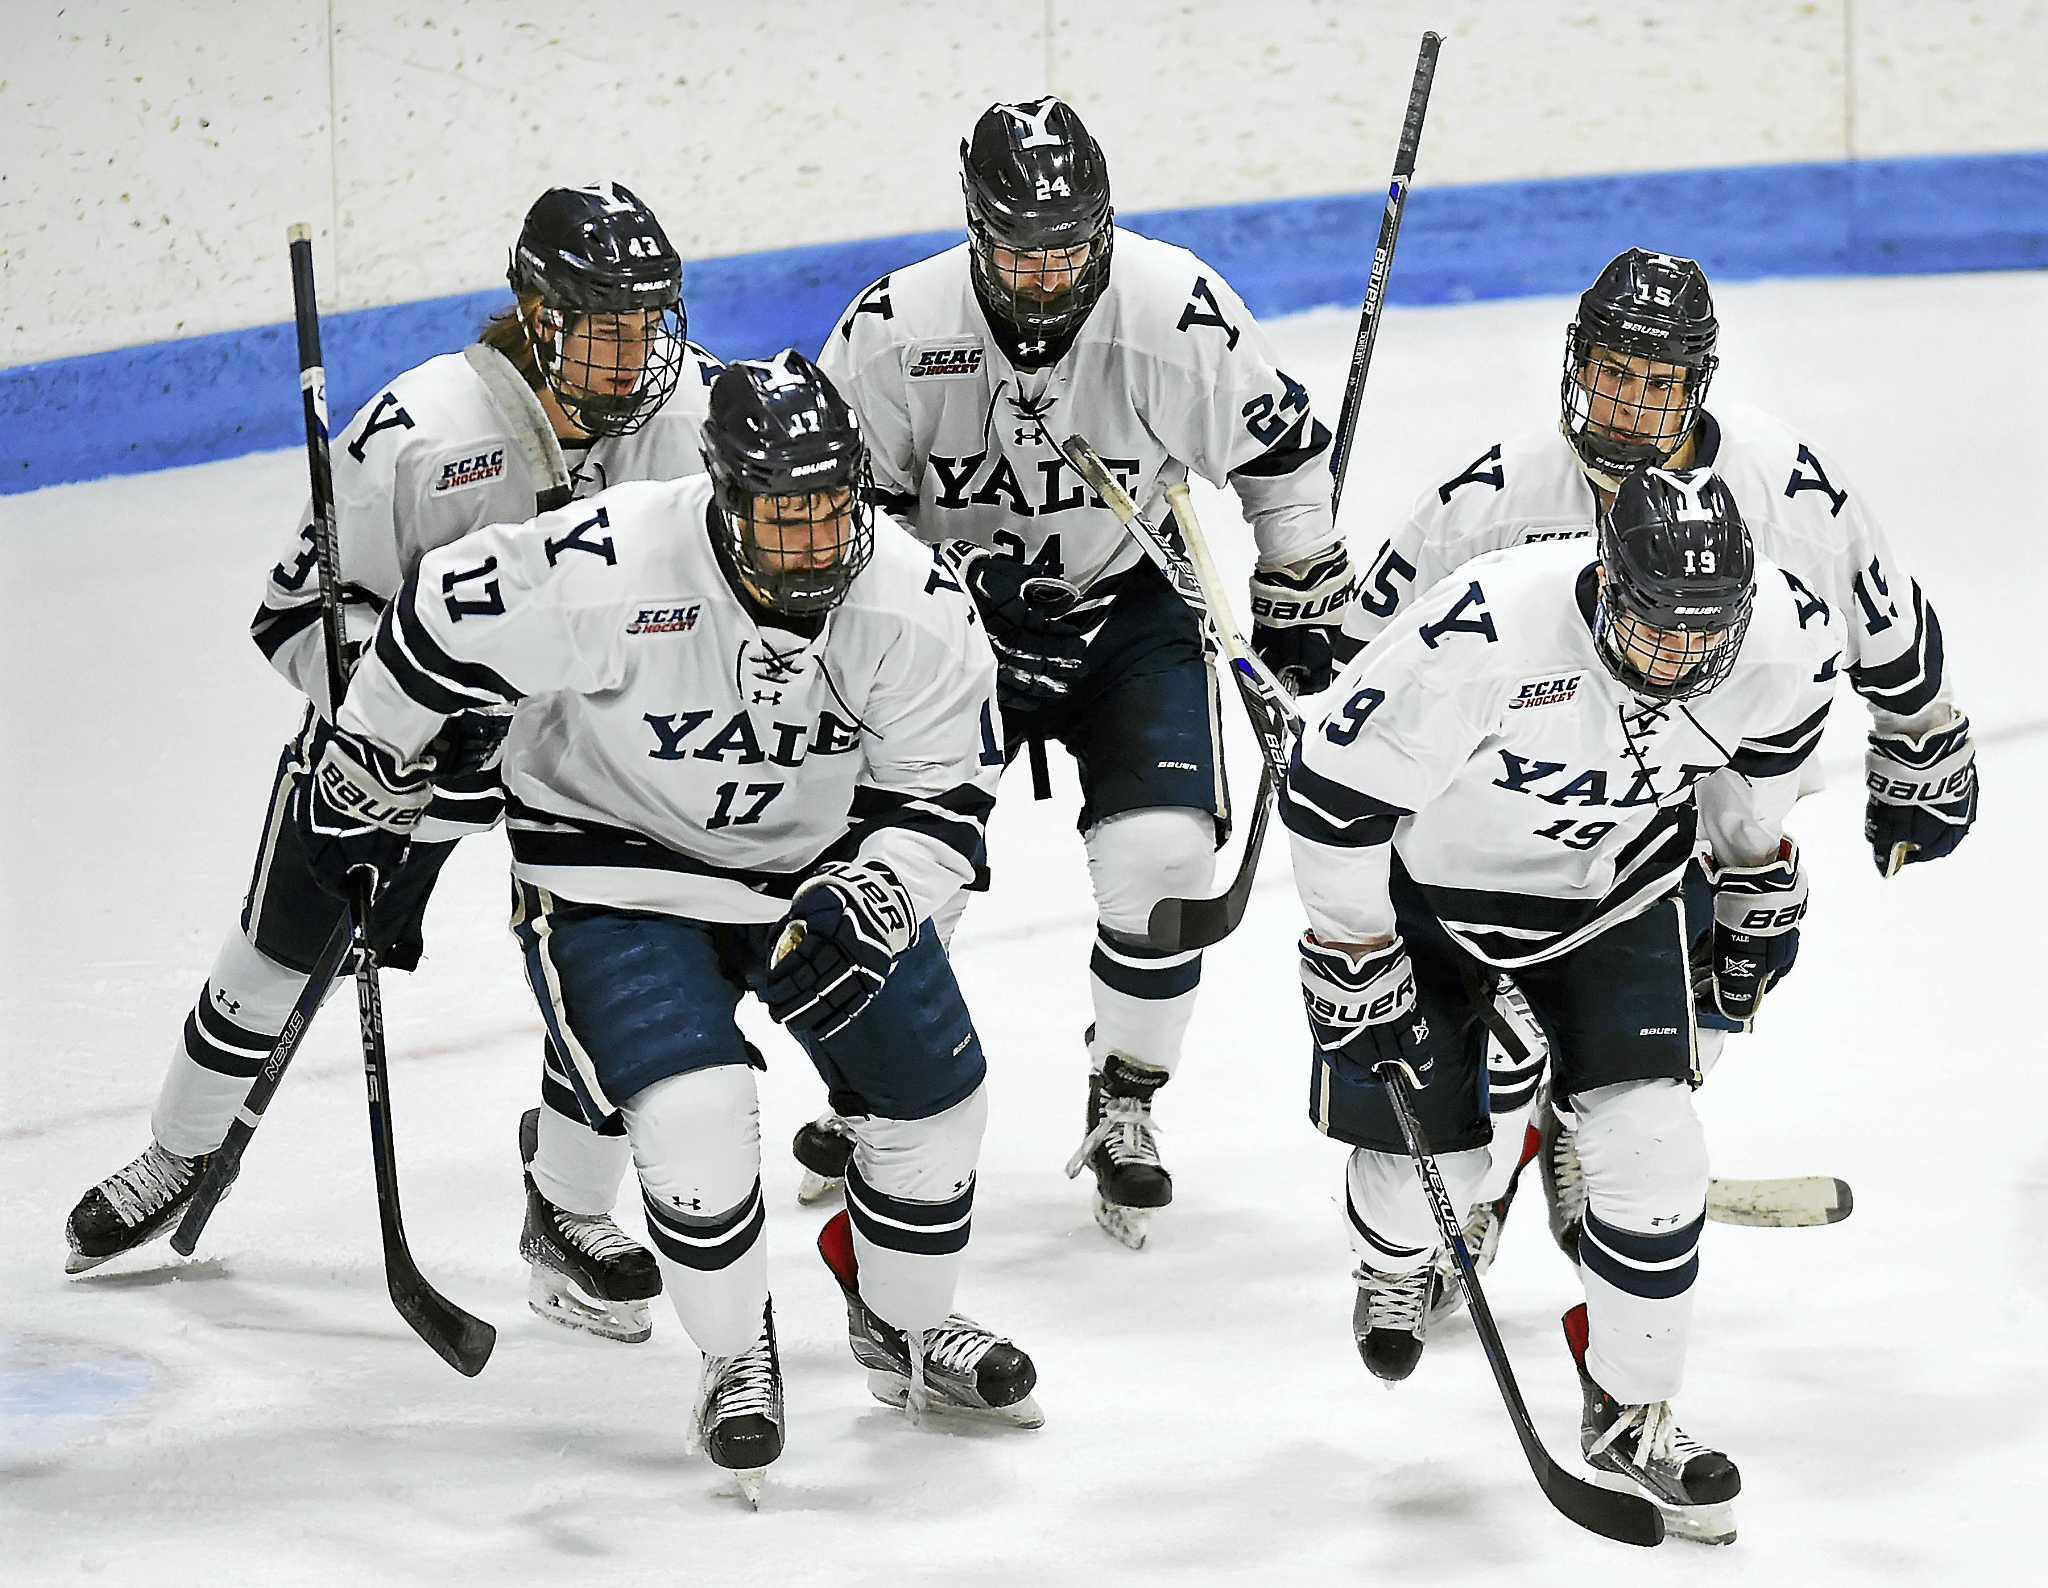 hockey teams march - HD2048×1588